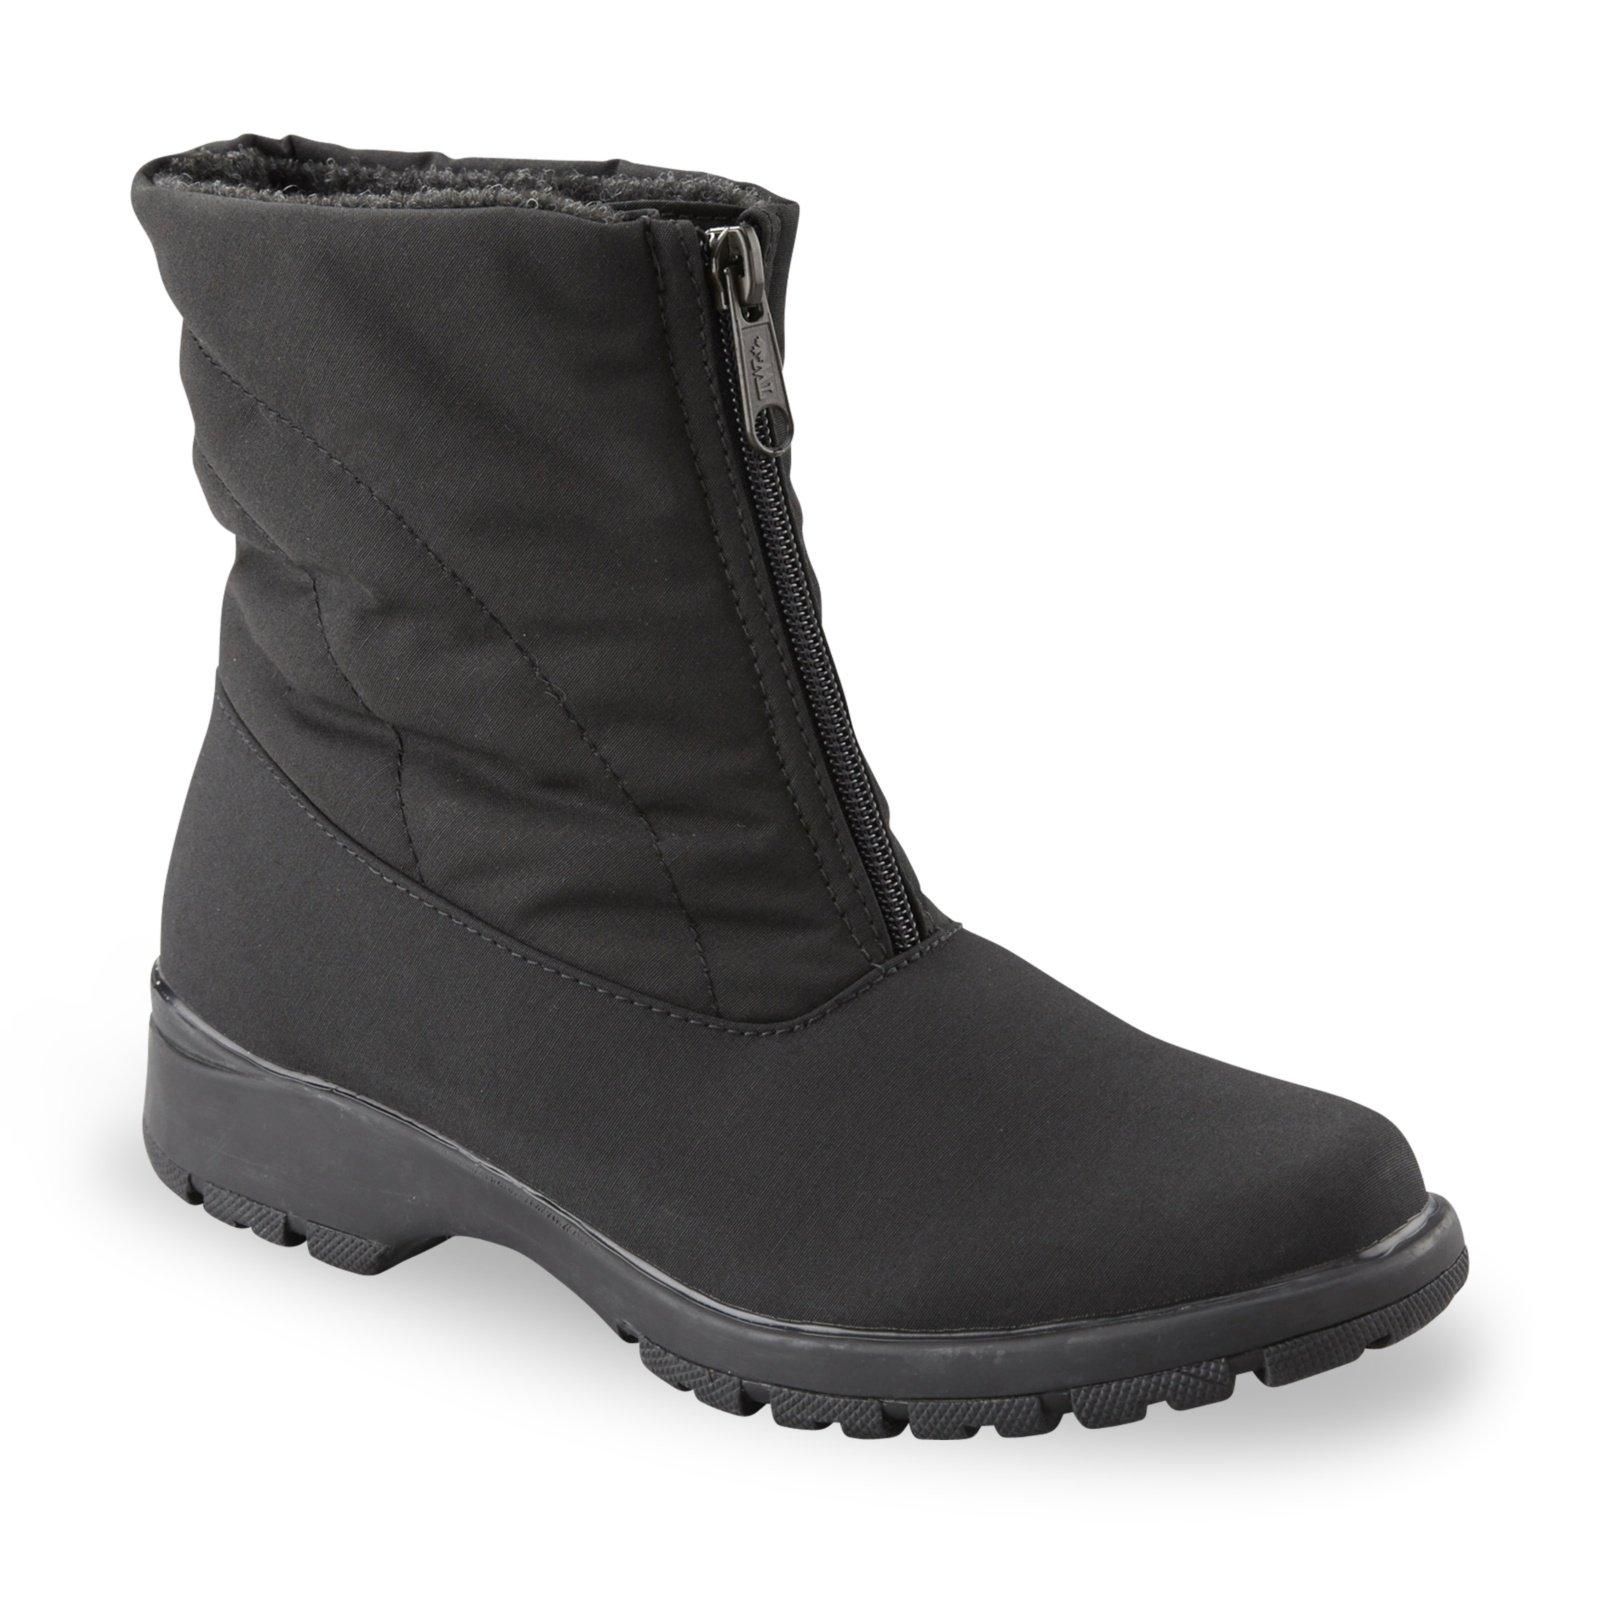 Toe Warmers Women's Magic Boots Black 7 M by Toe Warmers